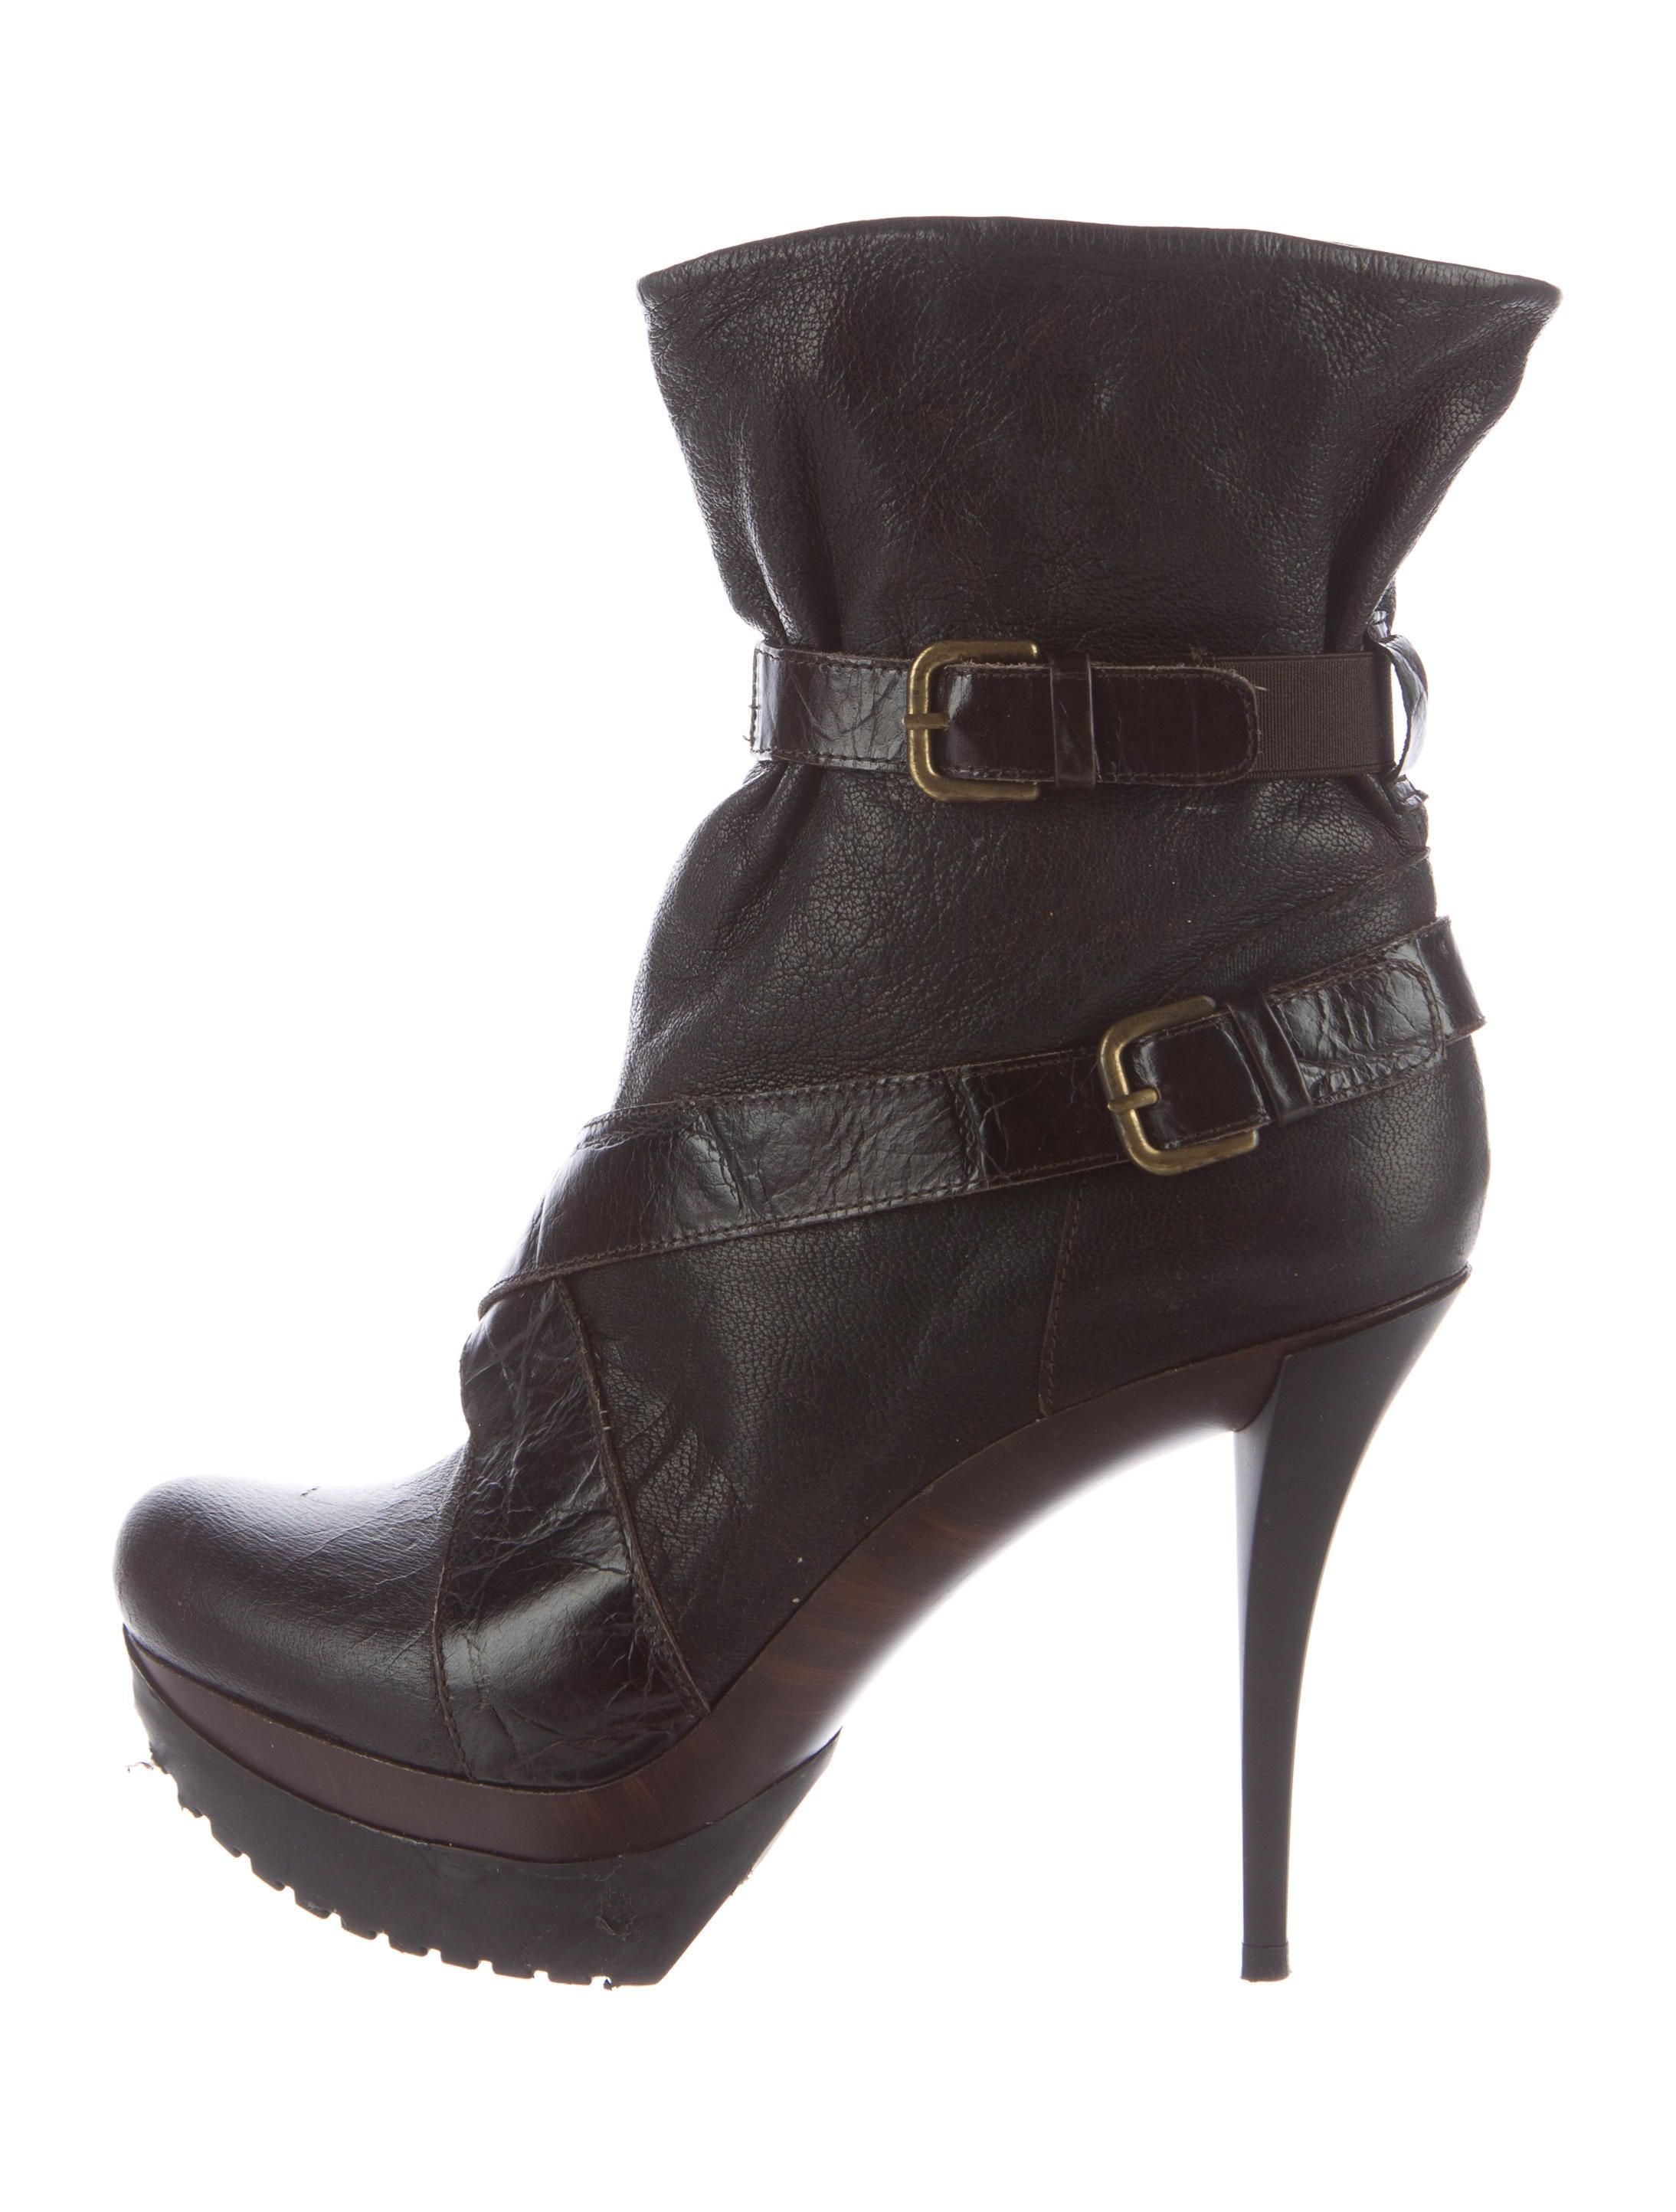 stuart weitzman leather platform boots shoes wsu31765